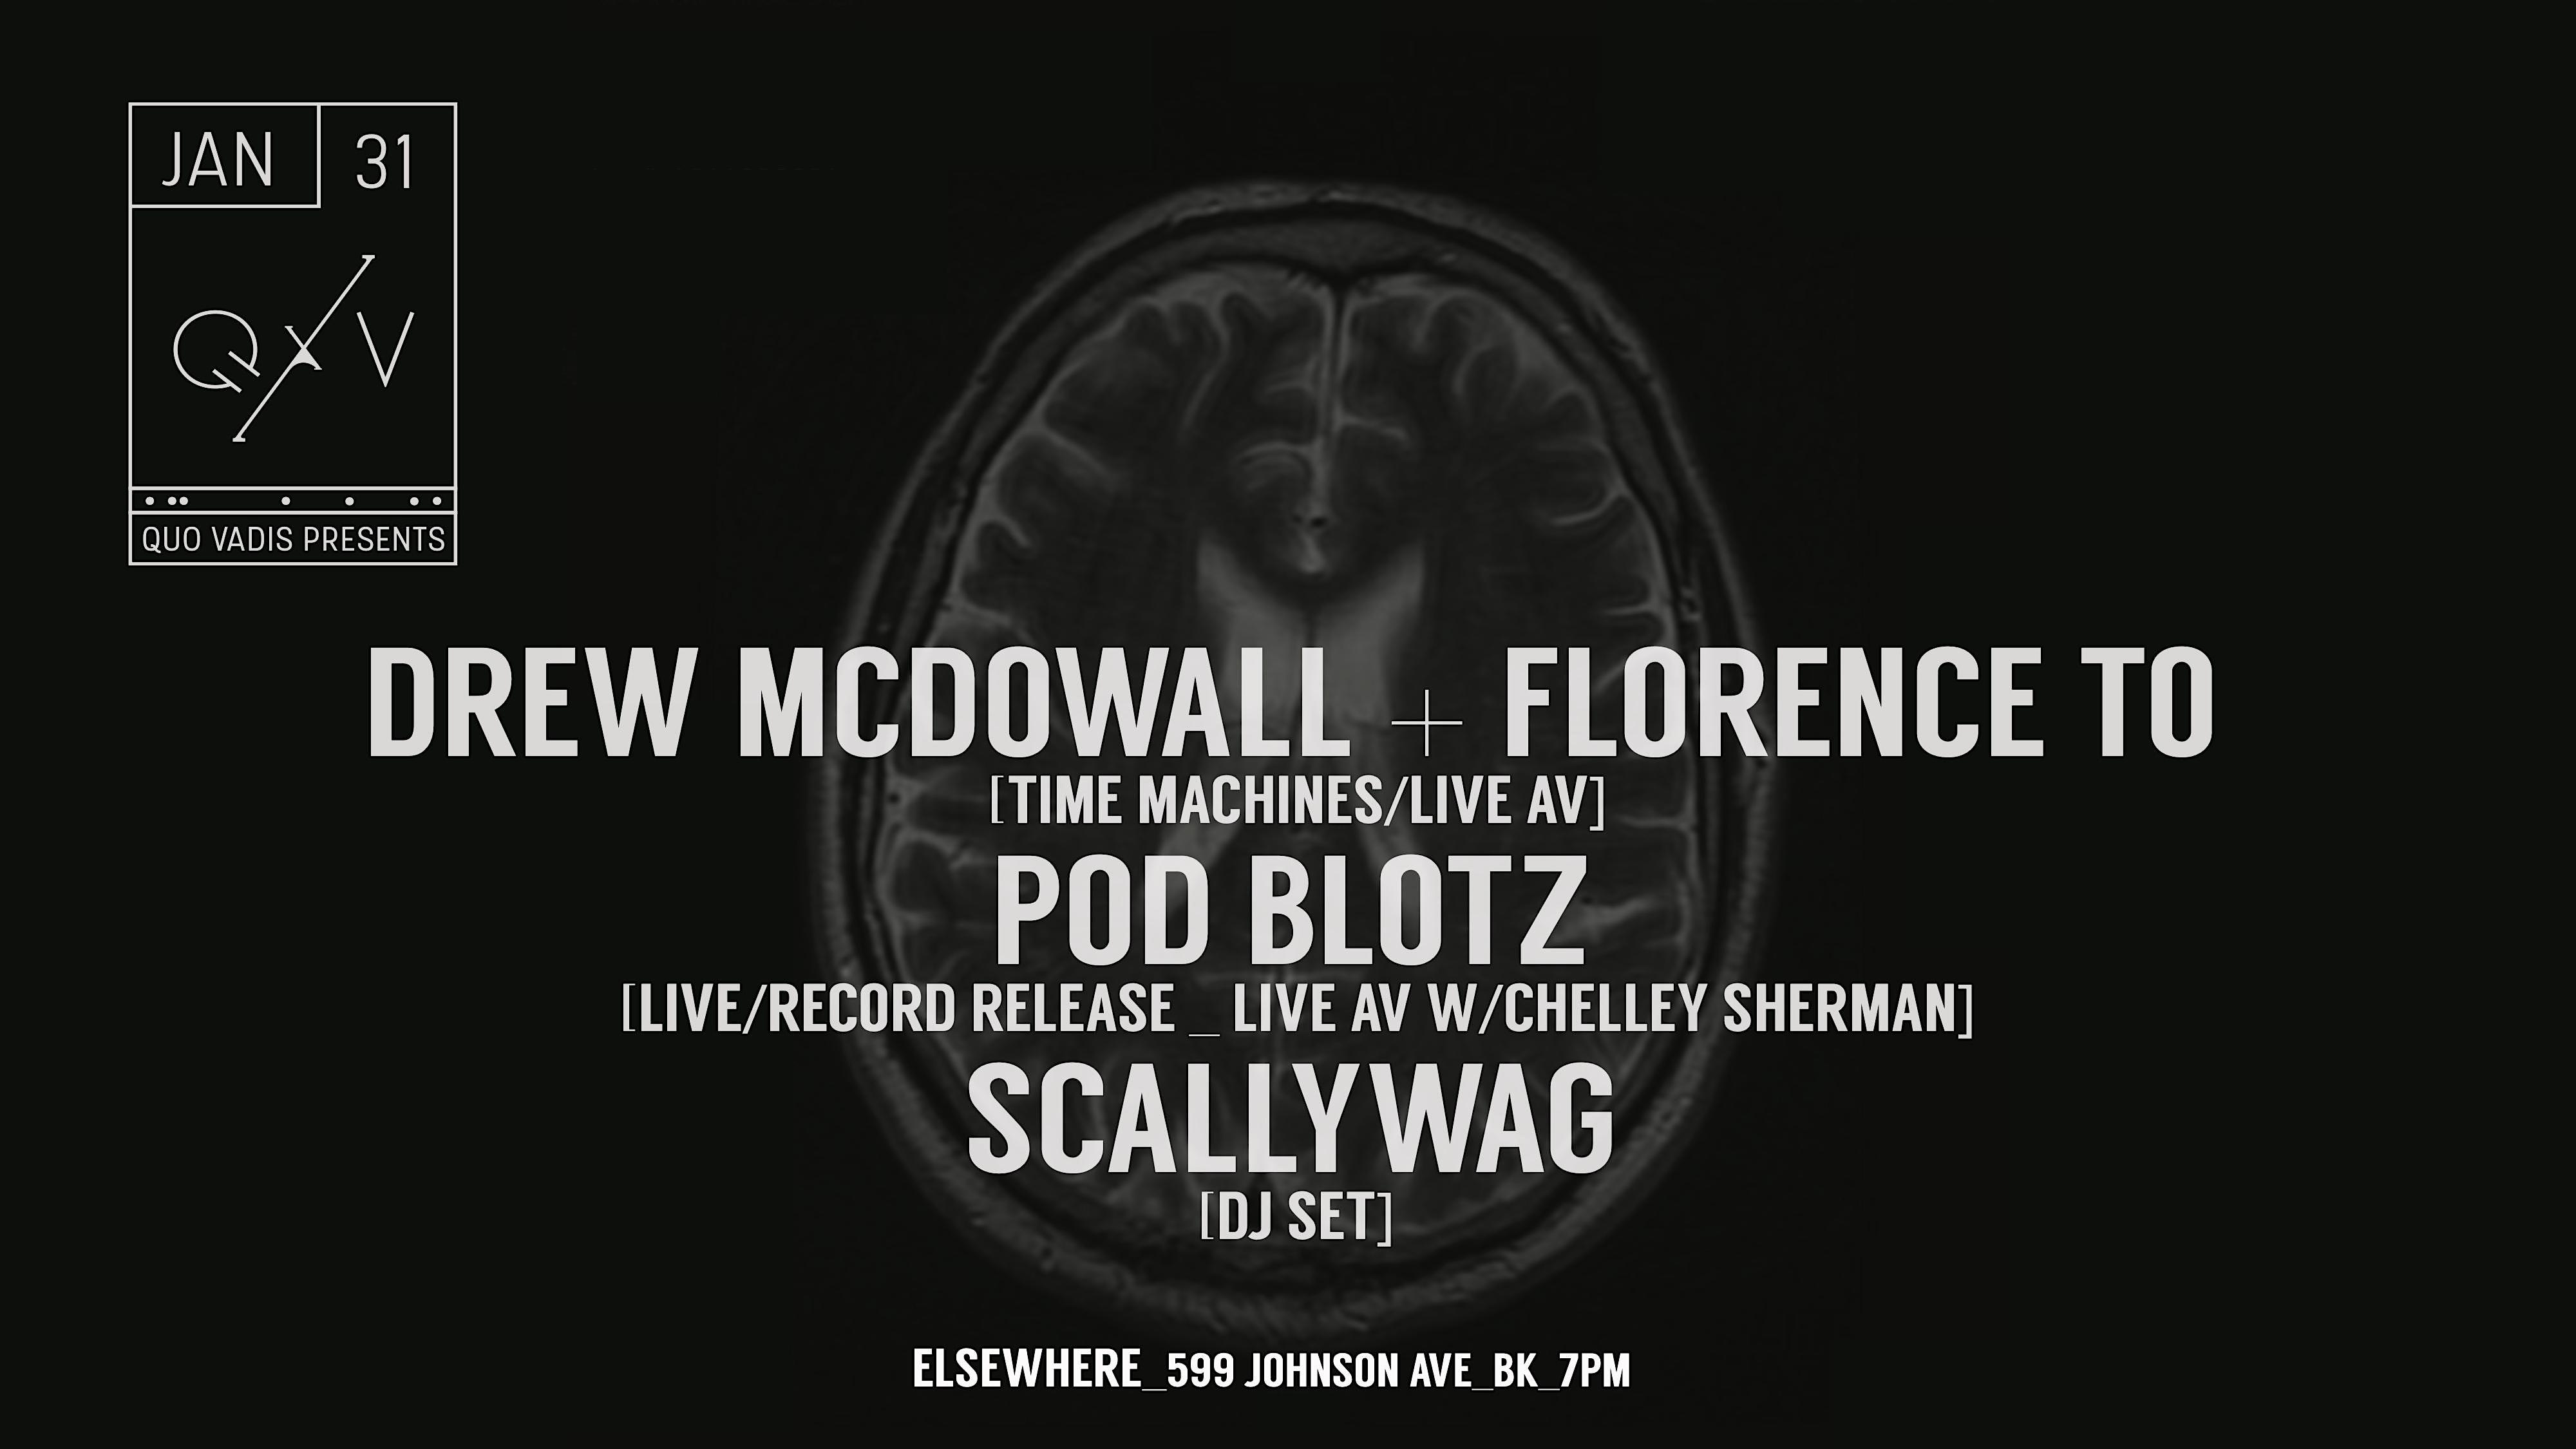 Quo Vadis Presents: Drew McDowall + Florence To [Time Machines / Live AV], Pod Blotz [Live] & Scallywag